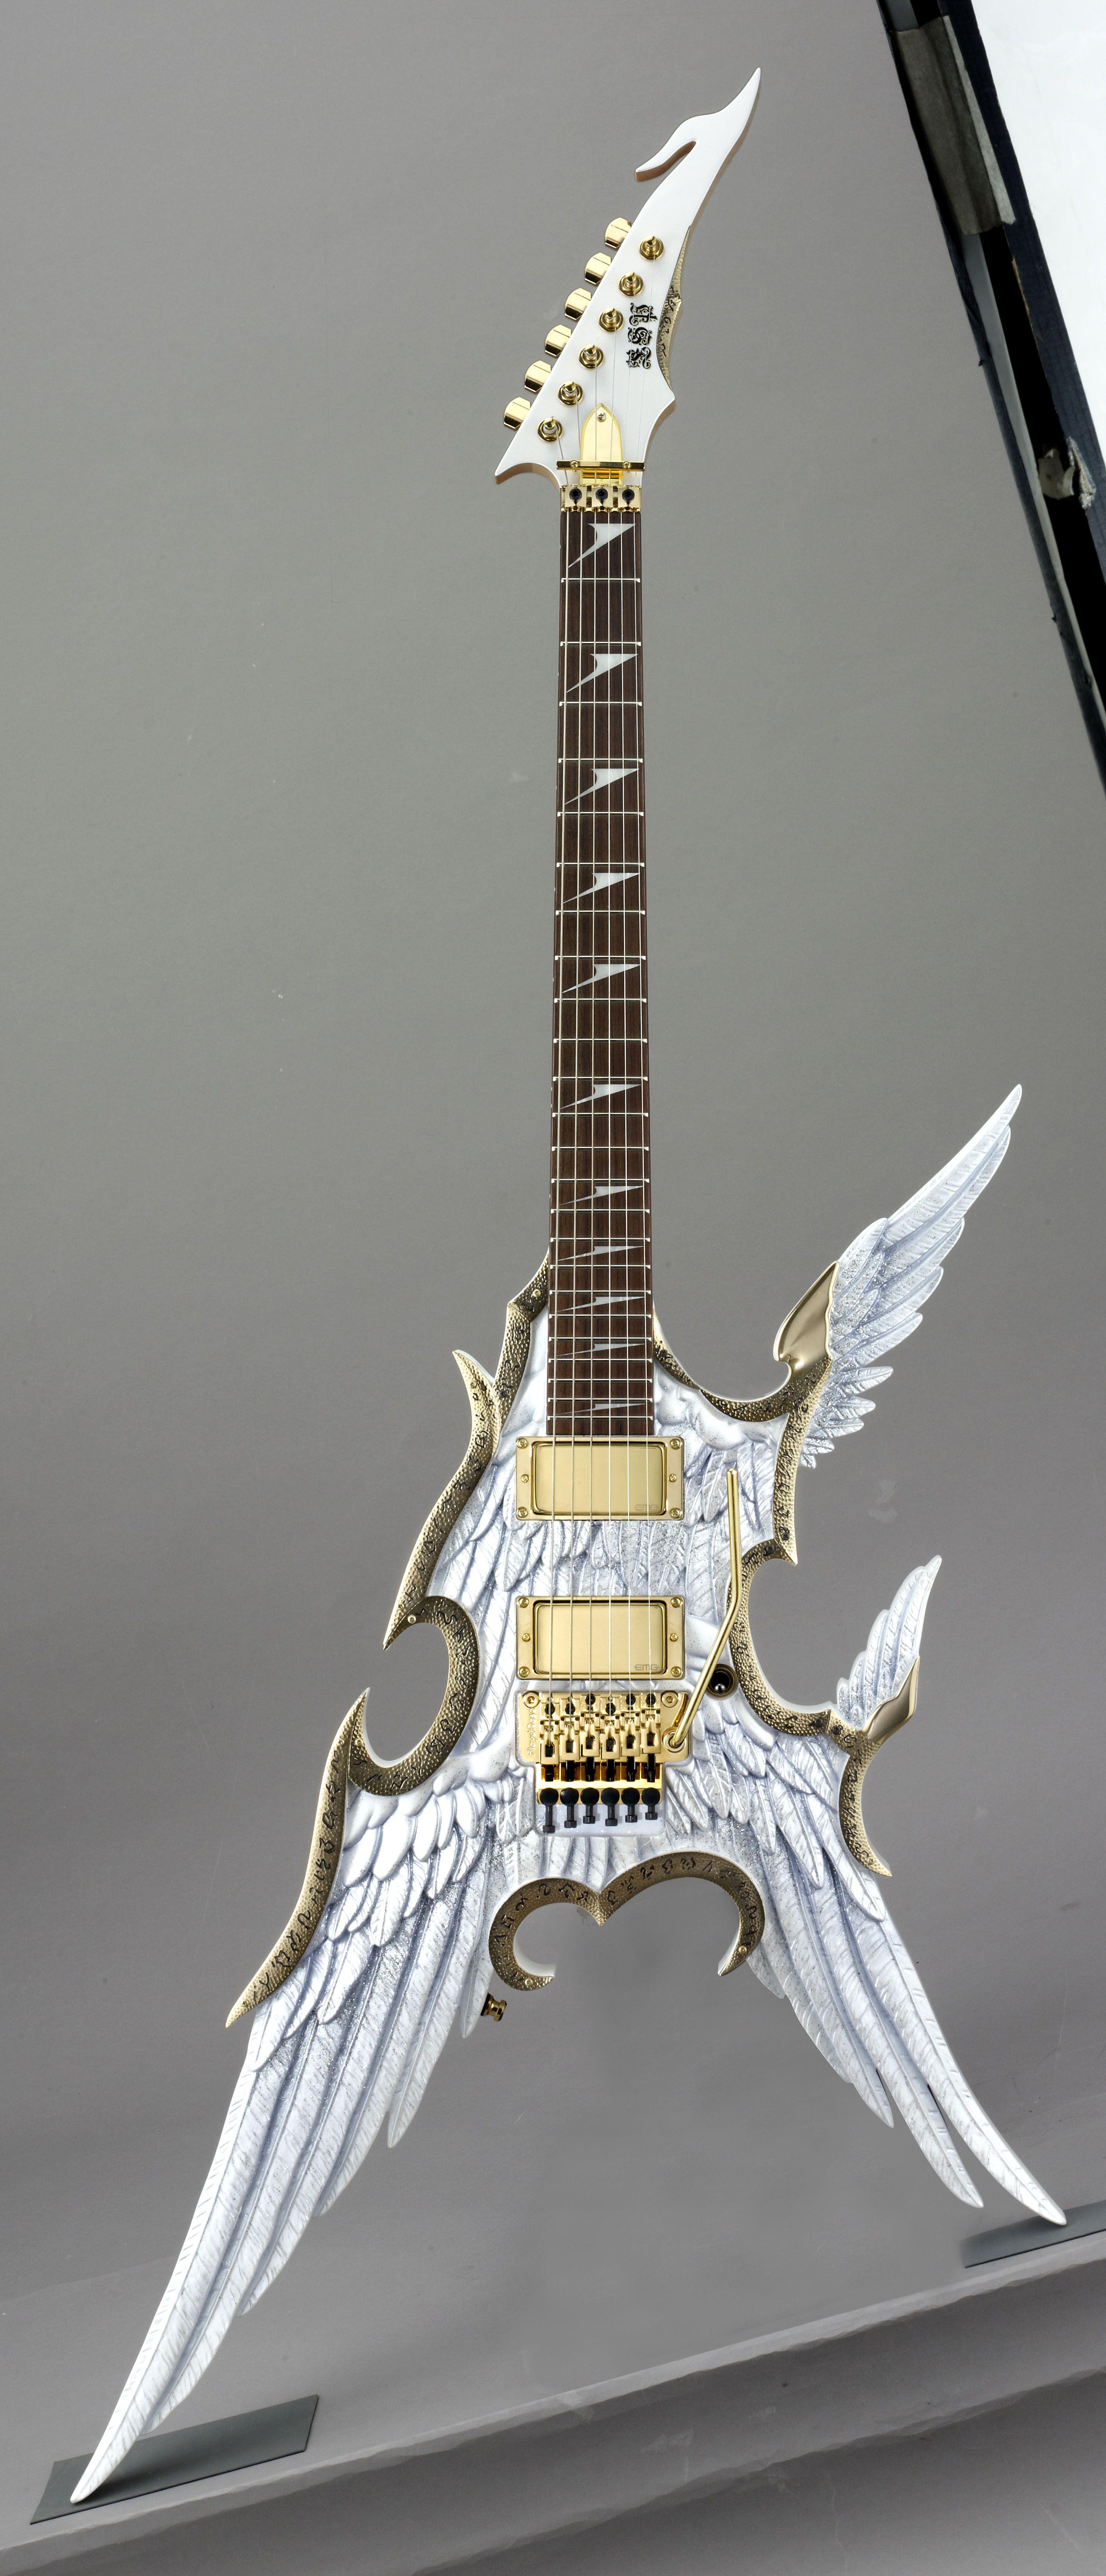 flying angel fantasia guitars esp guitarras musica instrumentos musica. Black Bedroom Furniture Sets. Home Design Ideas